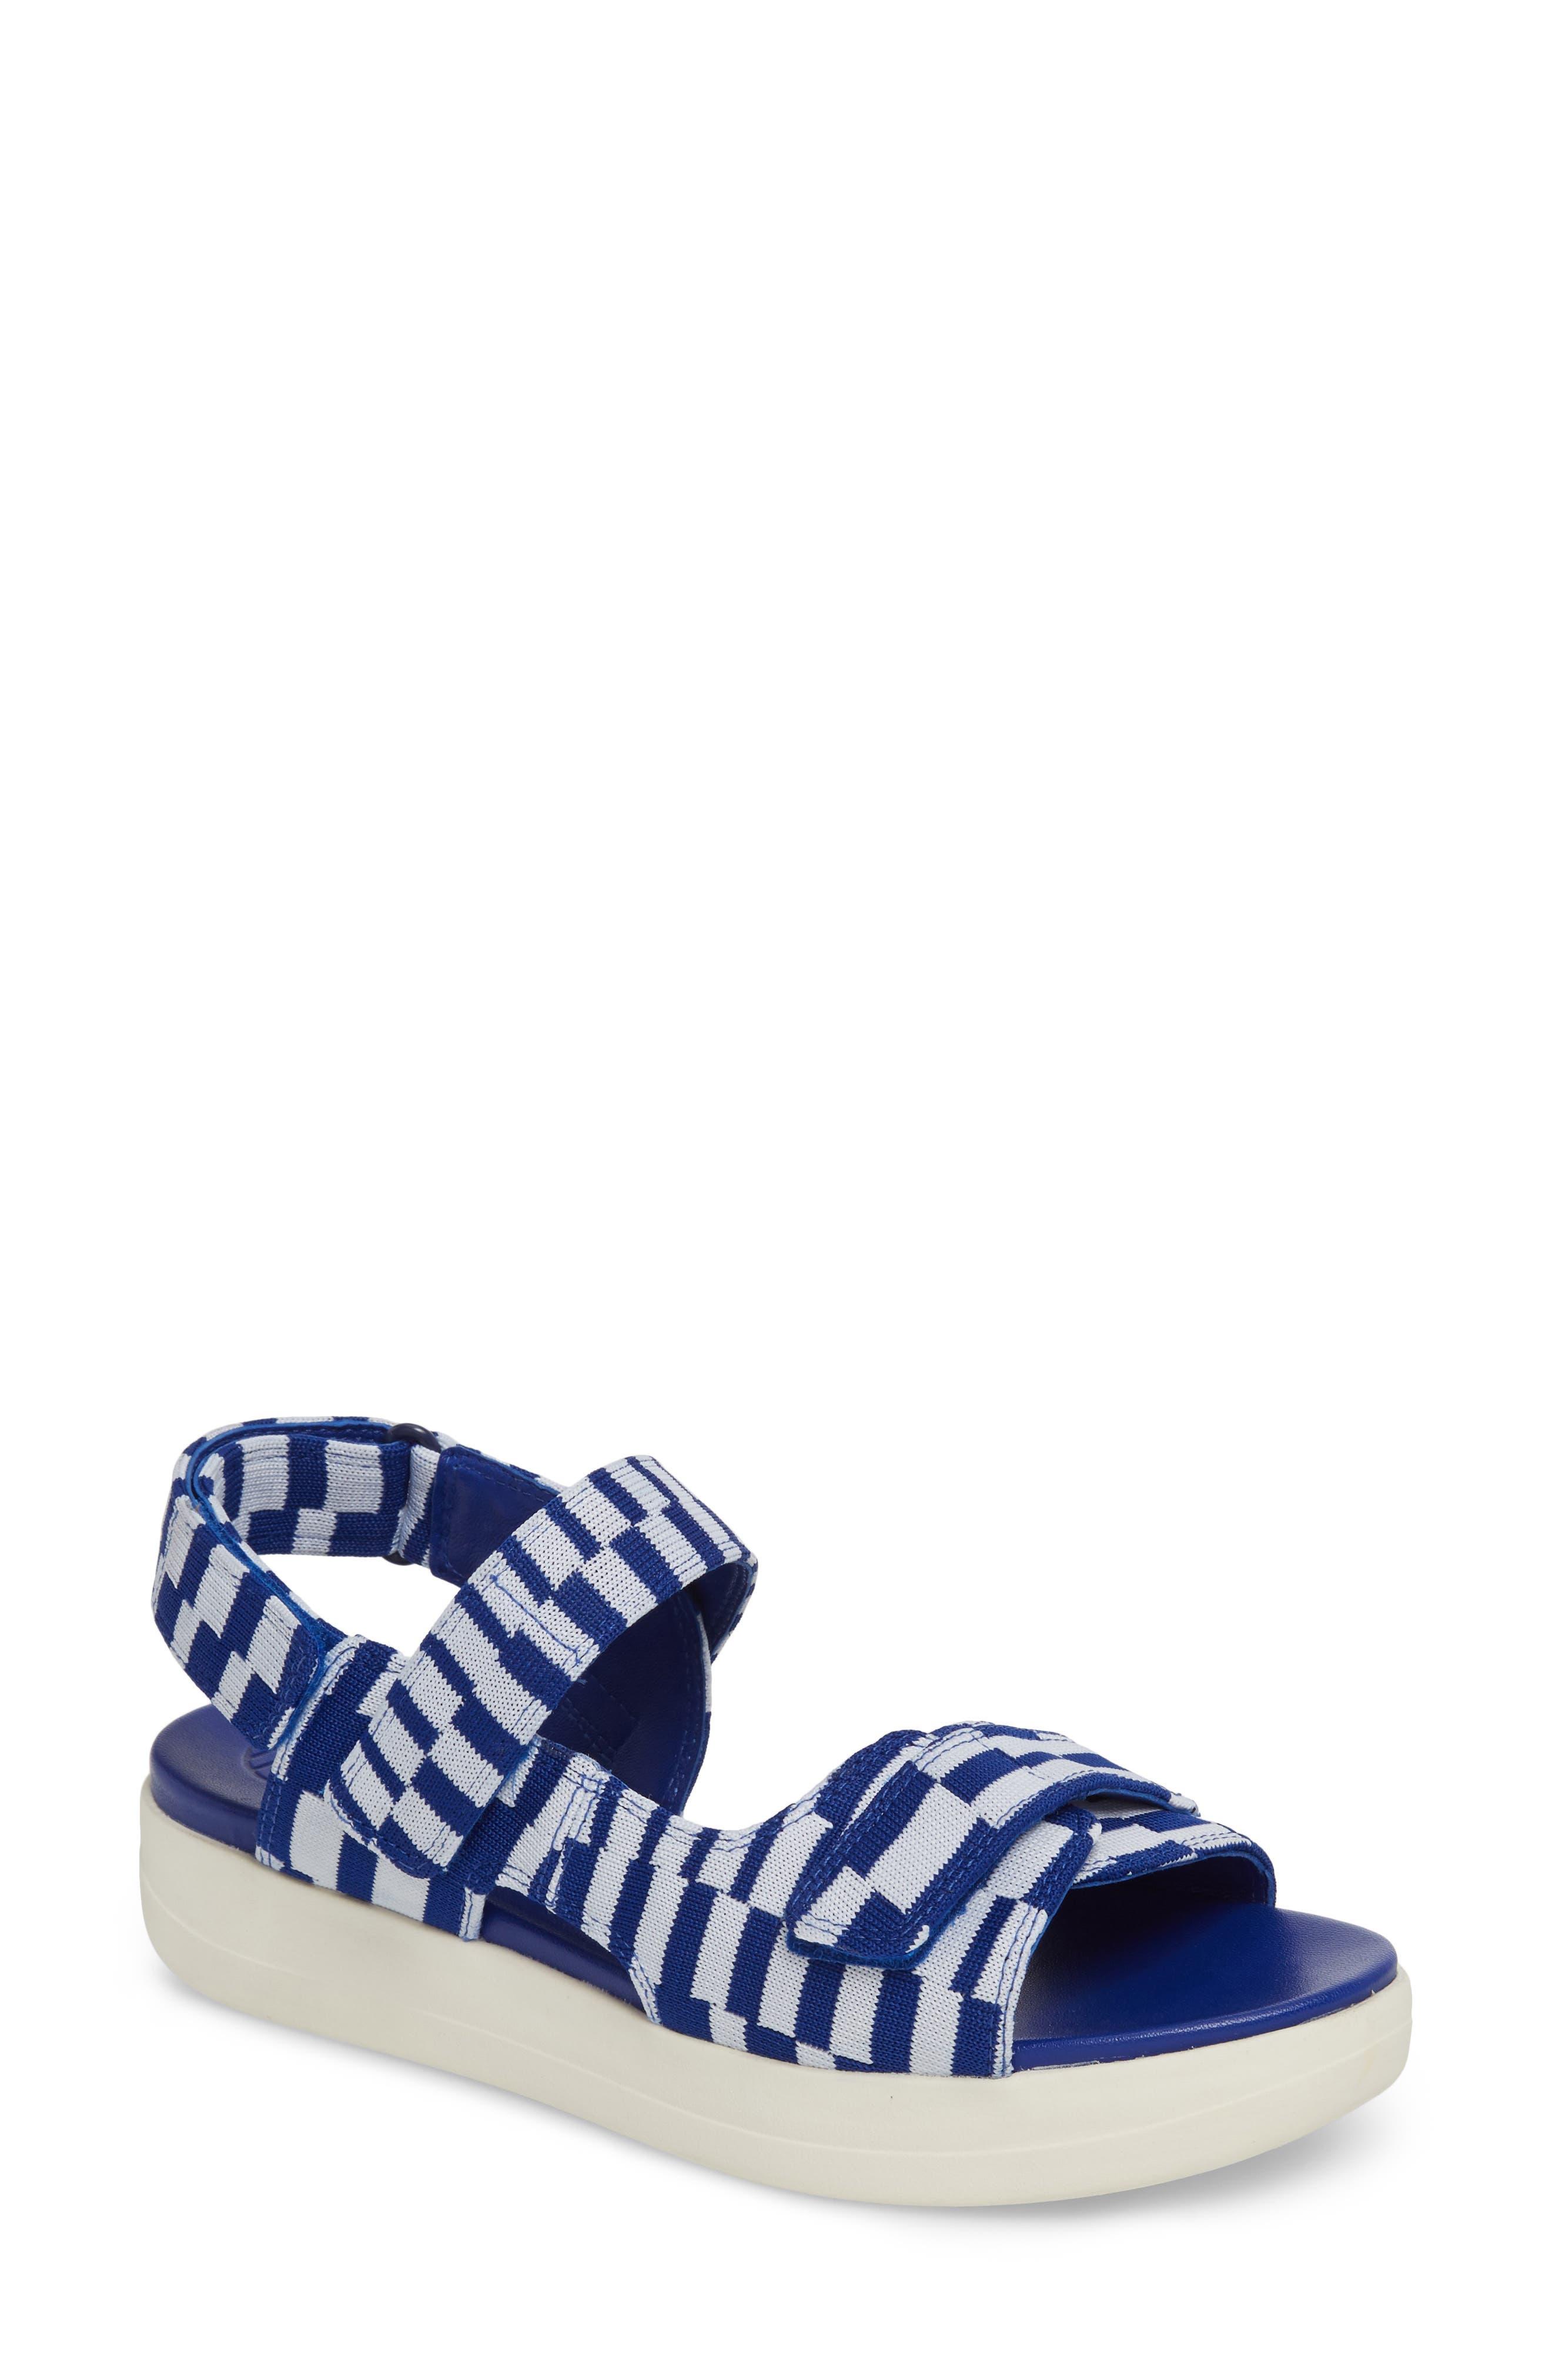 Flatform Sandal,                         Main,                         color, Check Slalom Blue